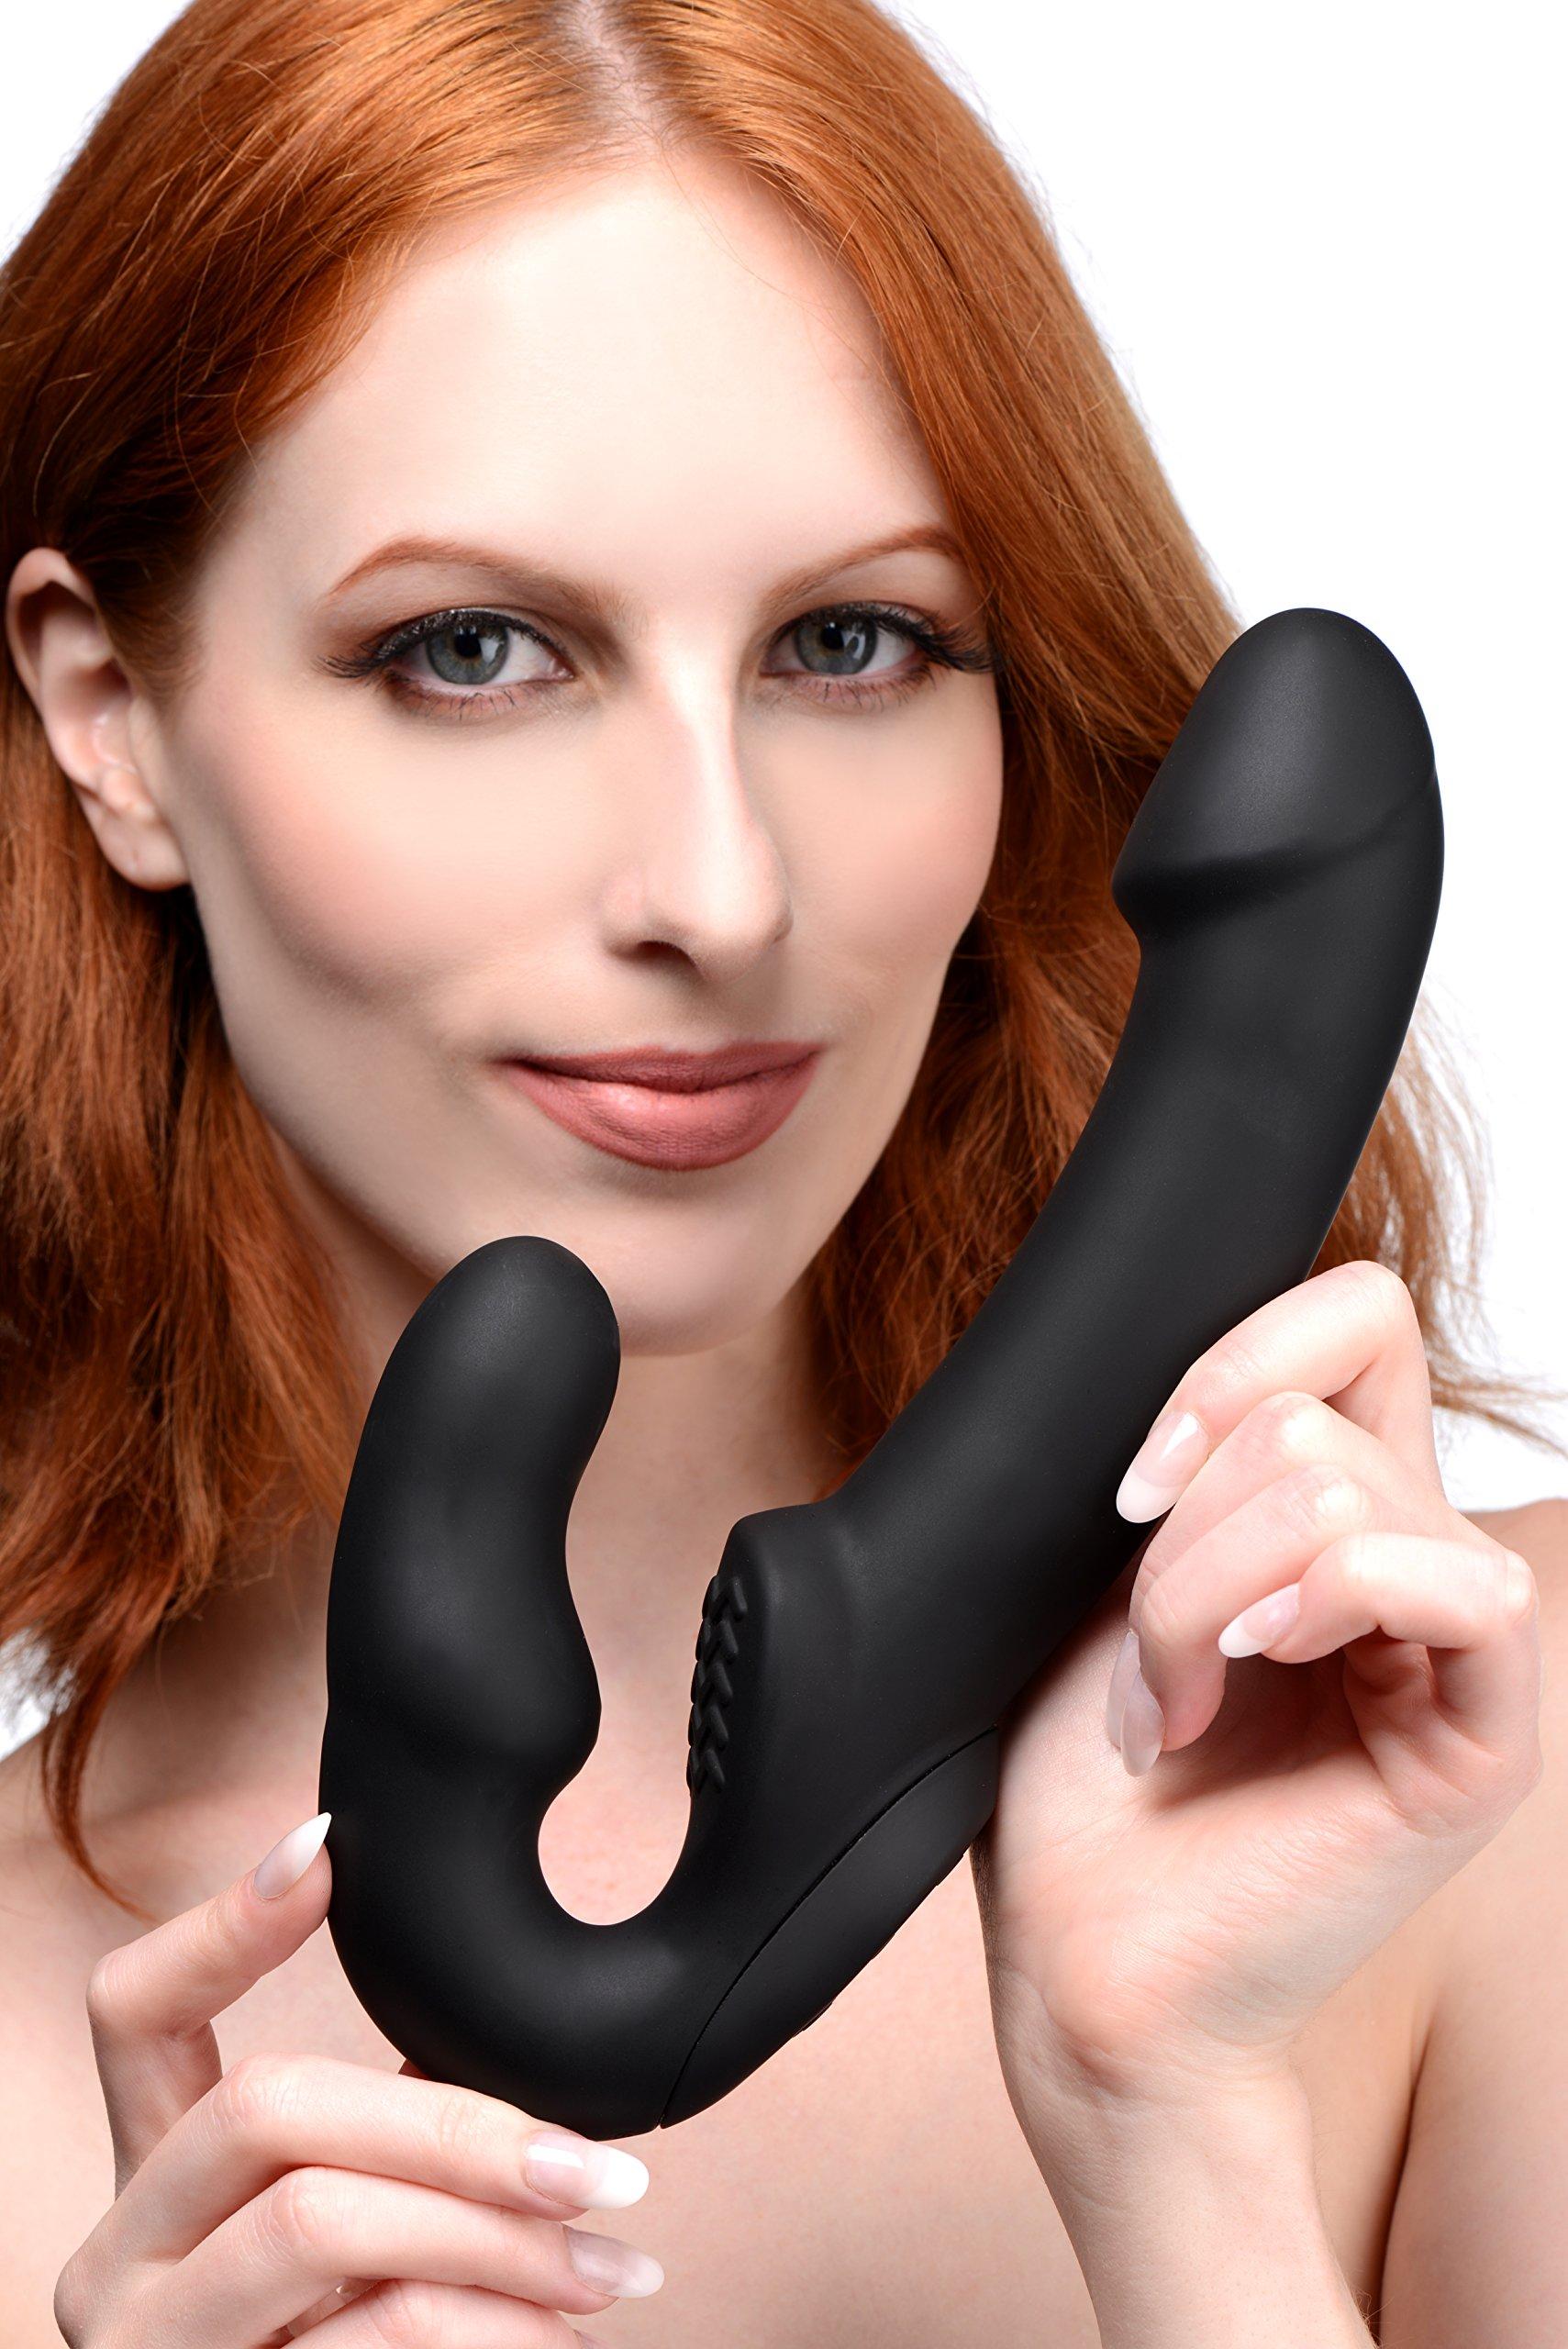 Strap U Evoke Rechargeable Vibrating Silicone Strapless Strap On, Black